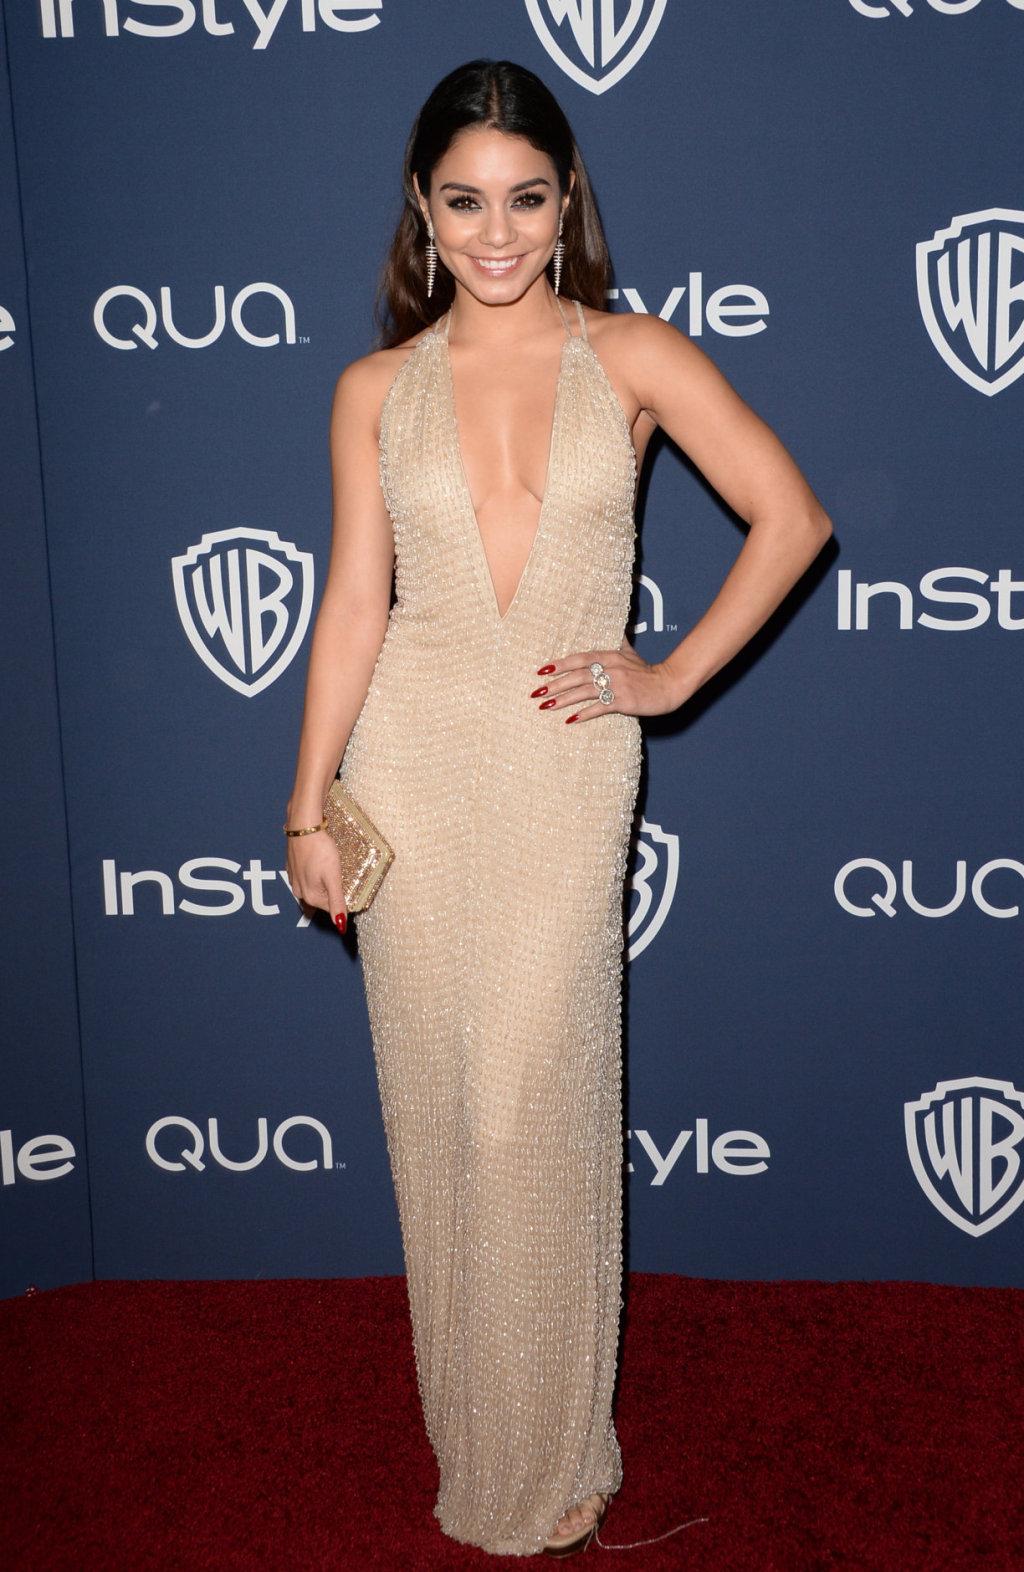 See Vanessa Hudgens Low Cut Dress At Golden Globes After Party VanessaHudgens TeenInfoNet